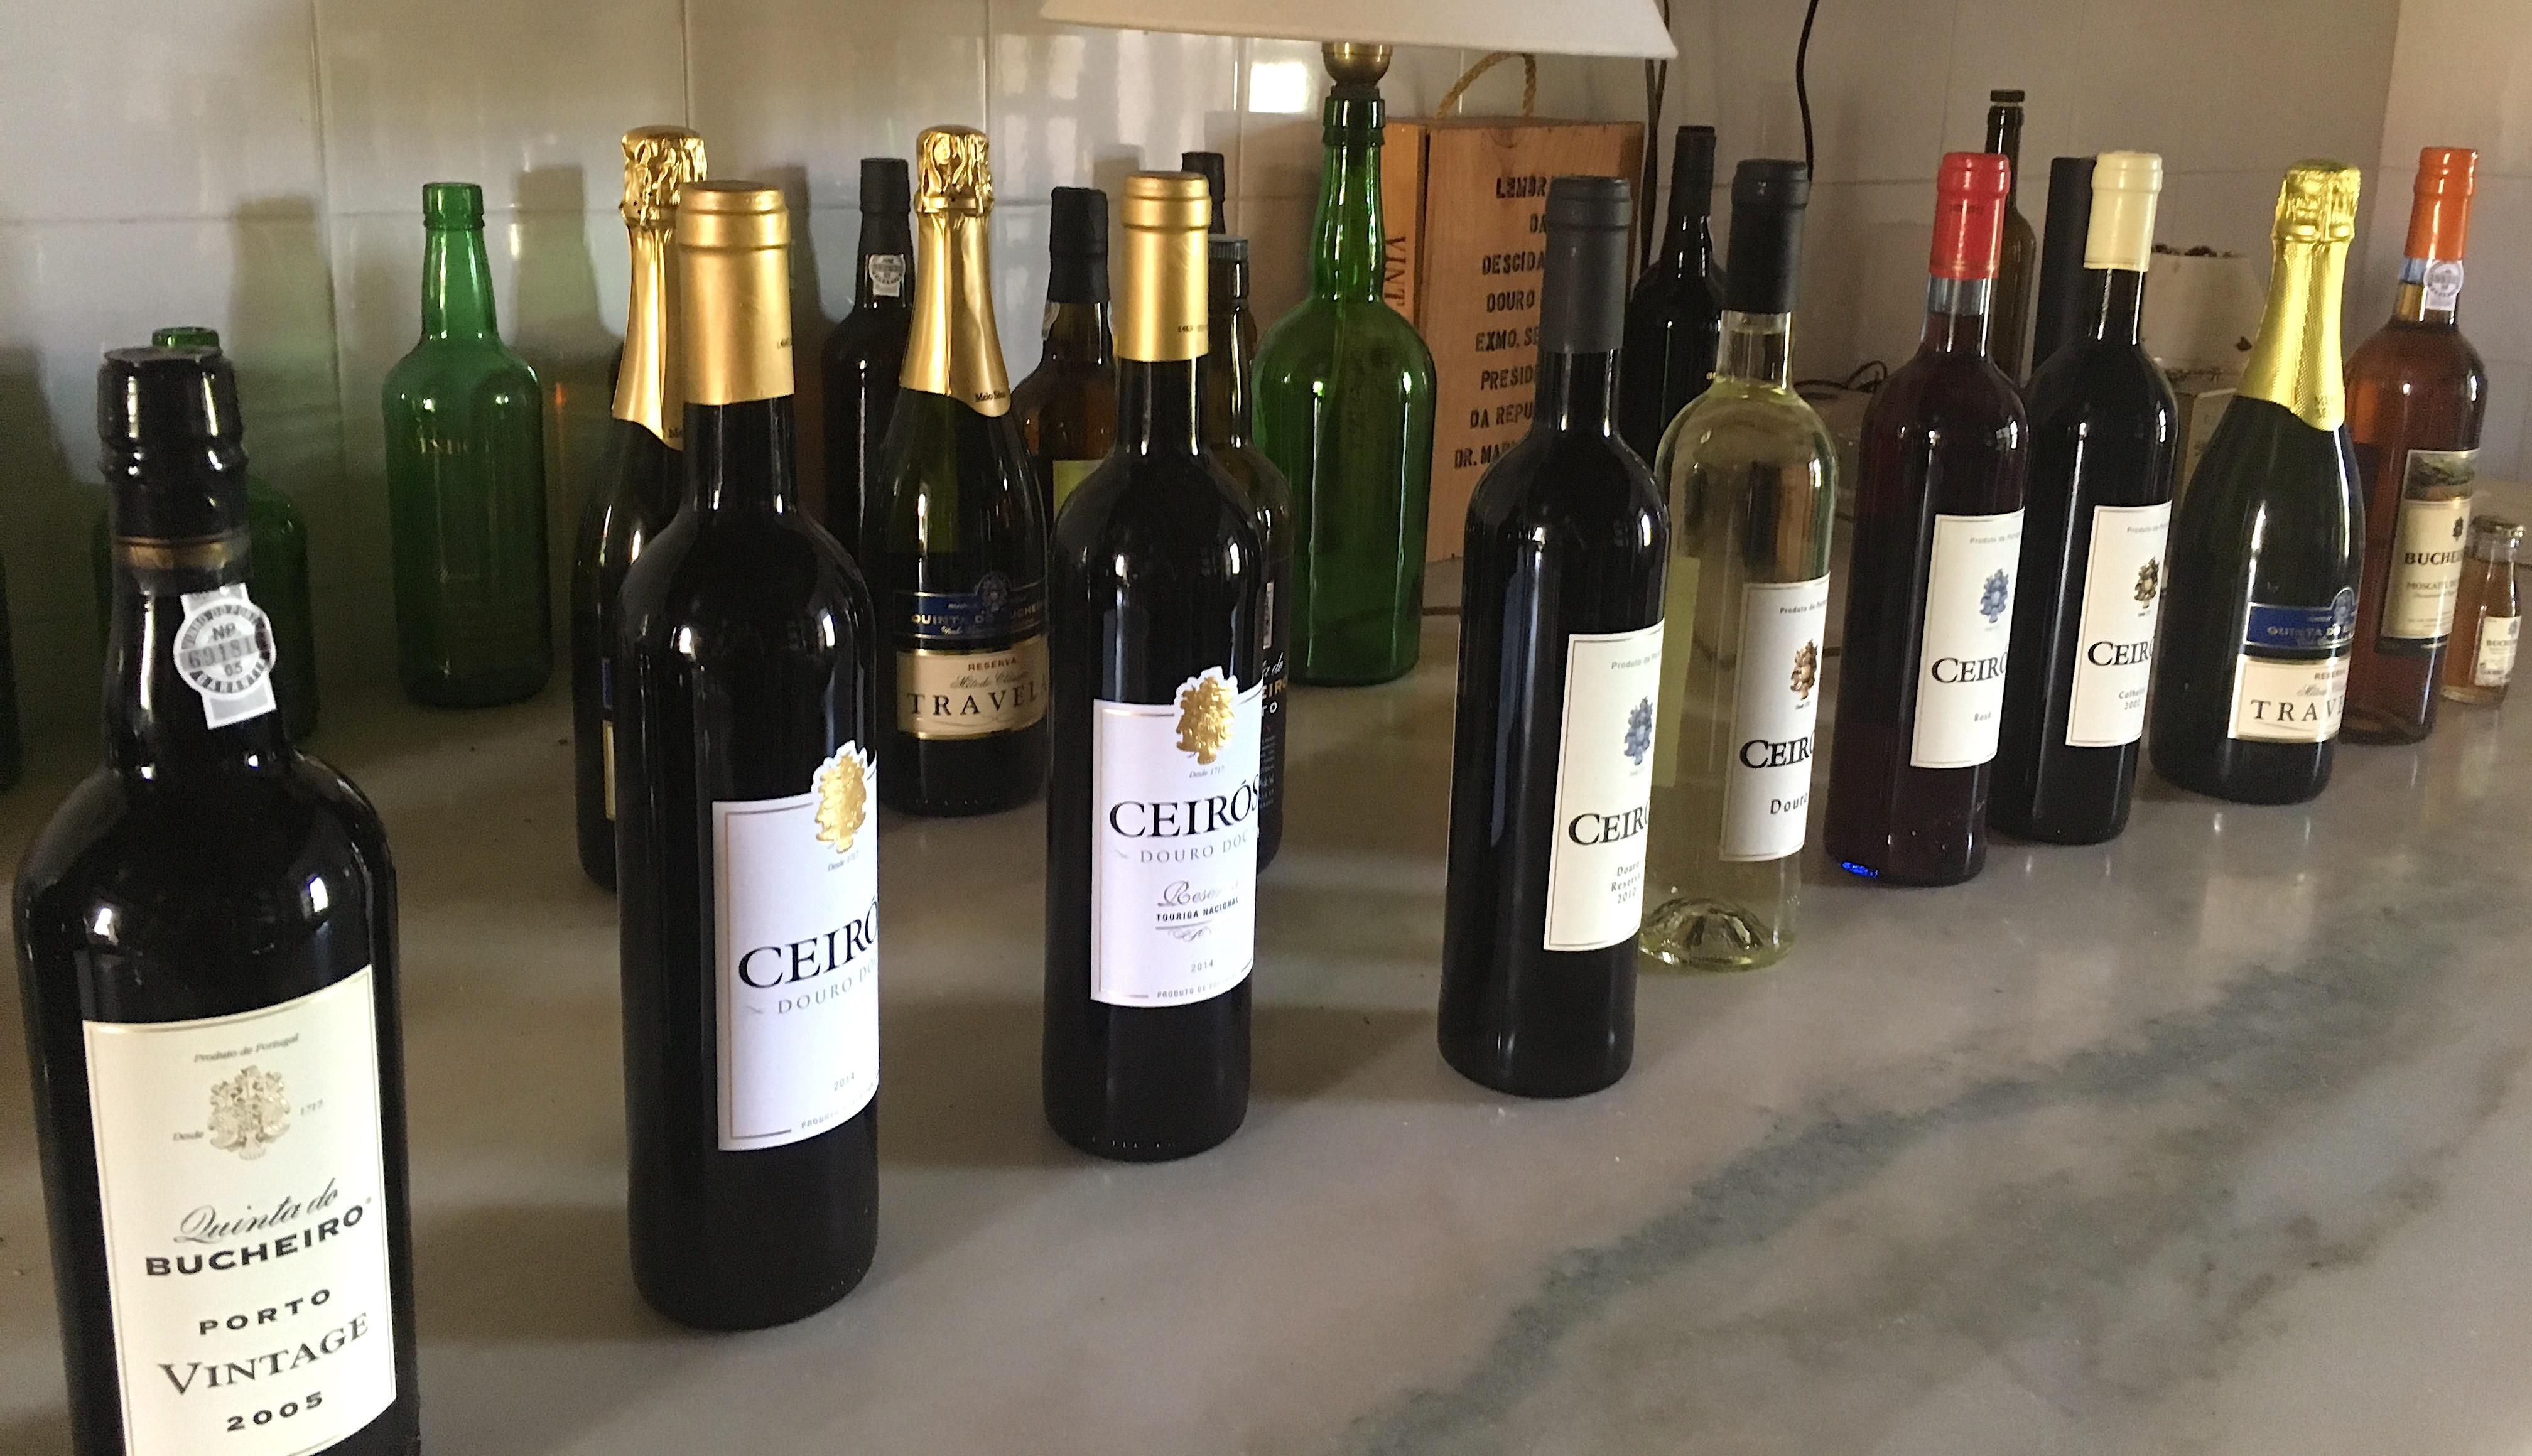 vinhos portugueses garrafas